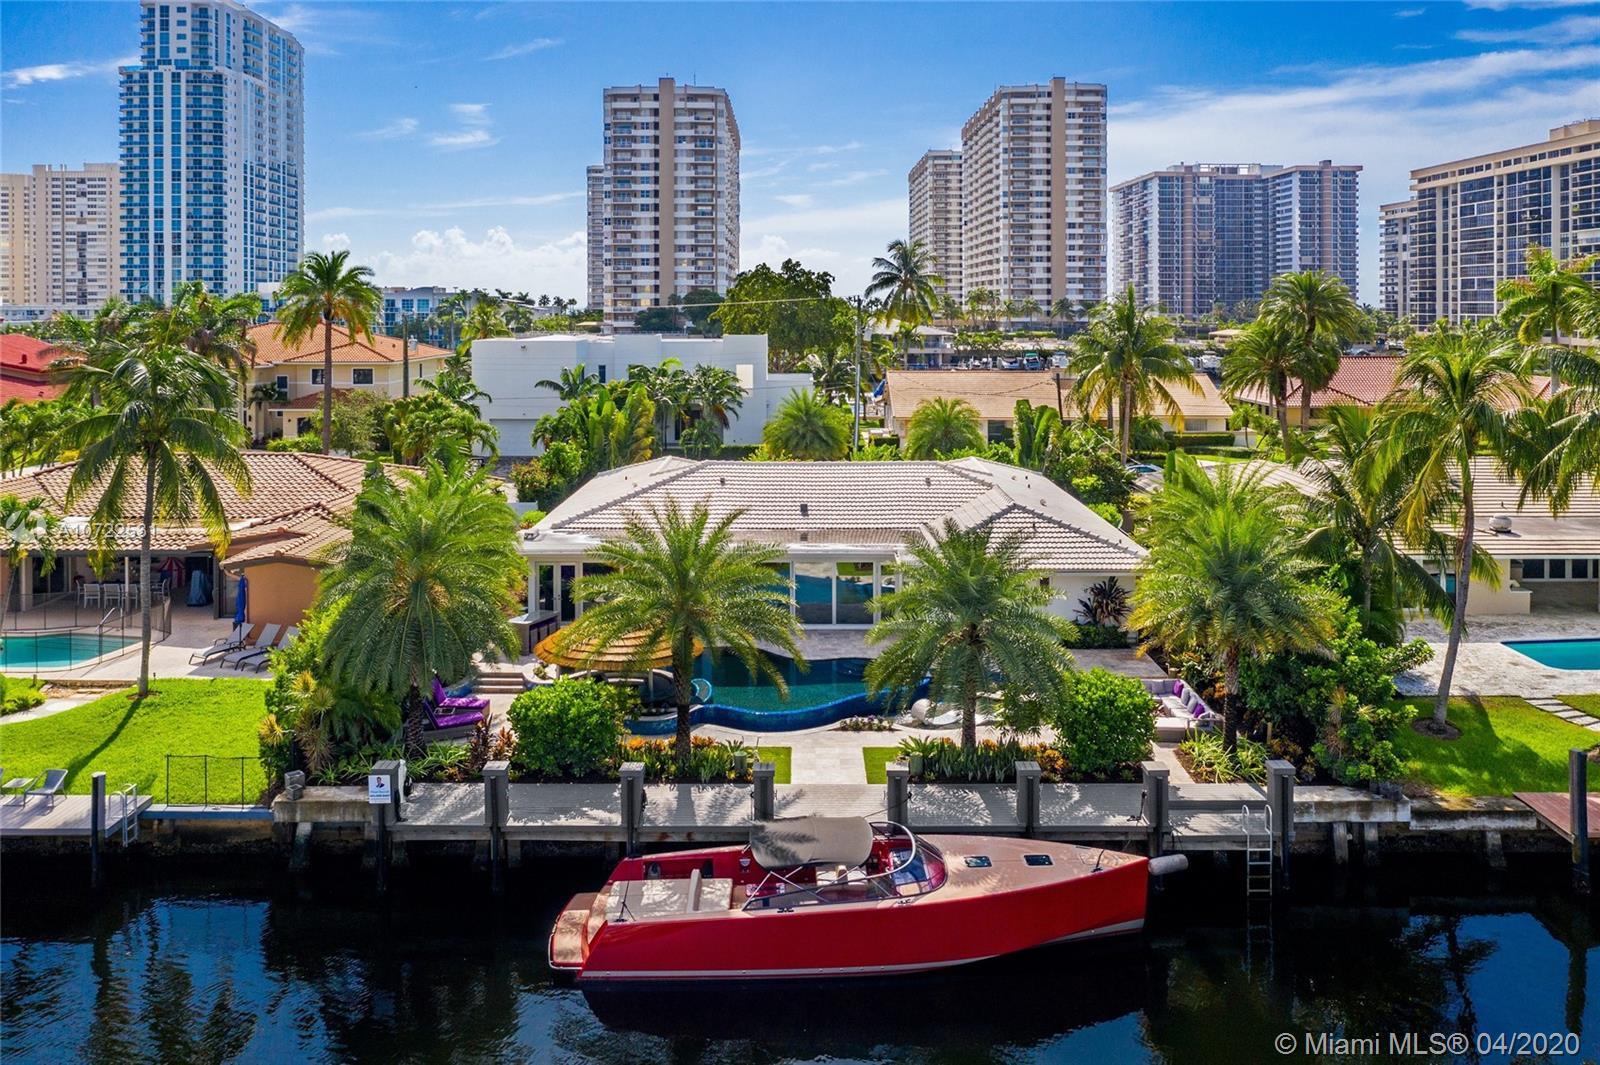 518 Palm Dr, Hallandale Beach, FL 33009